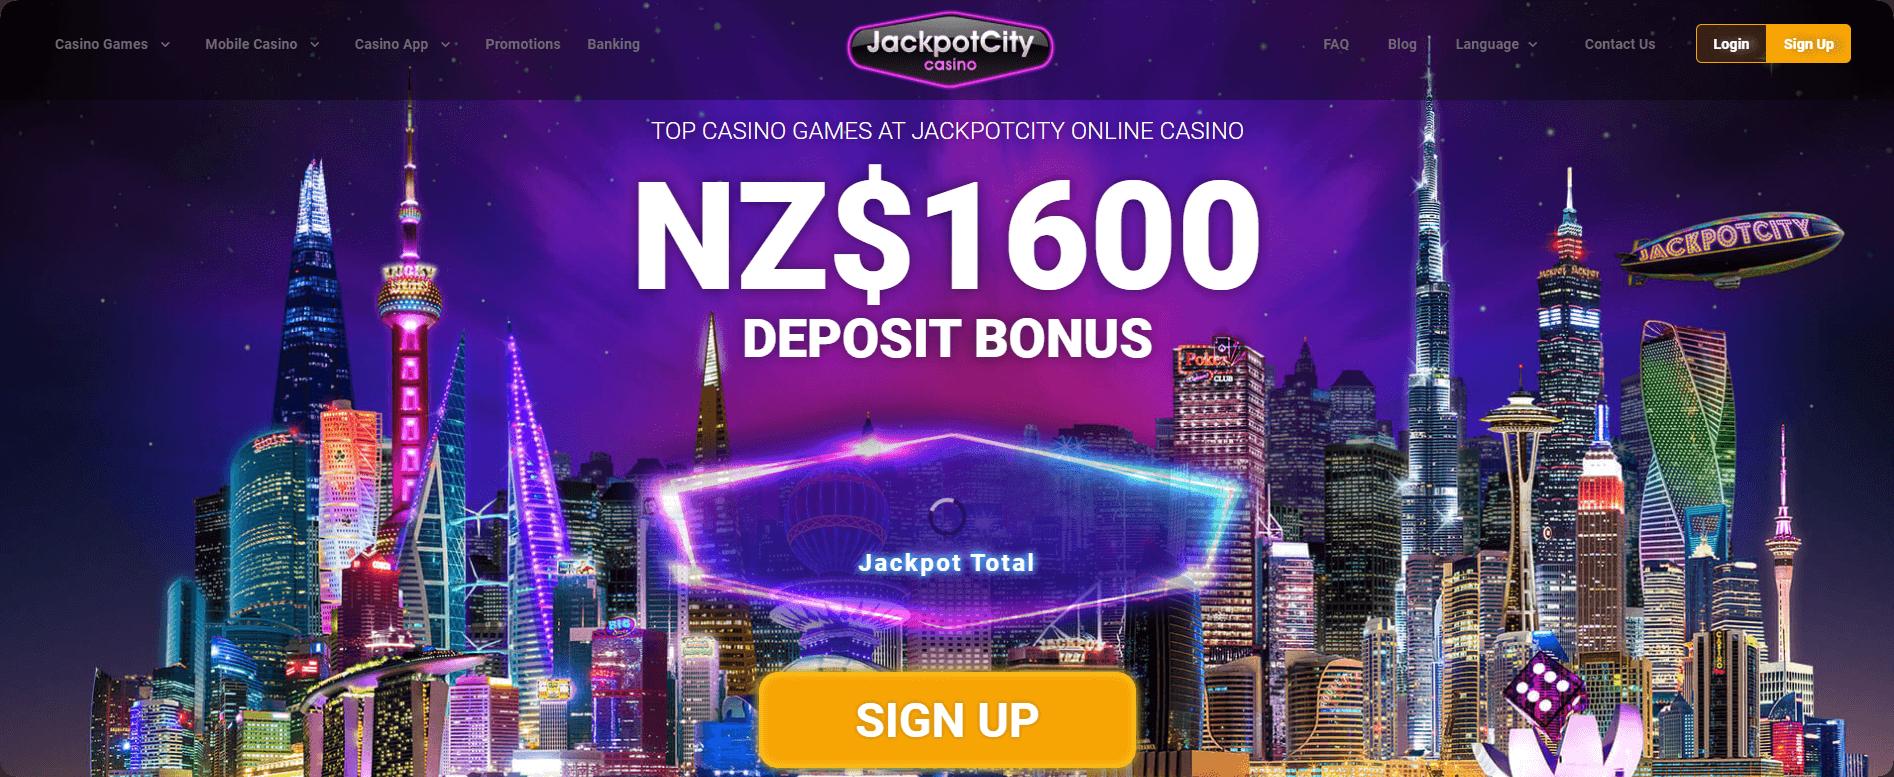 Jackpot City Welcome Bonus offer